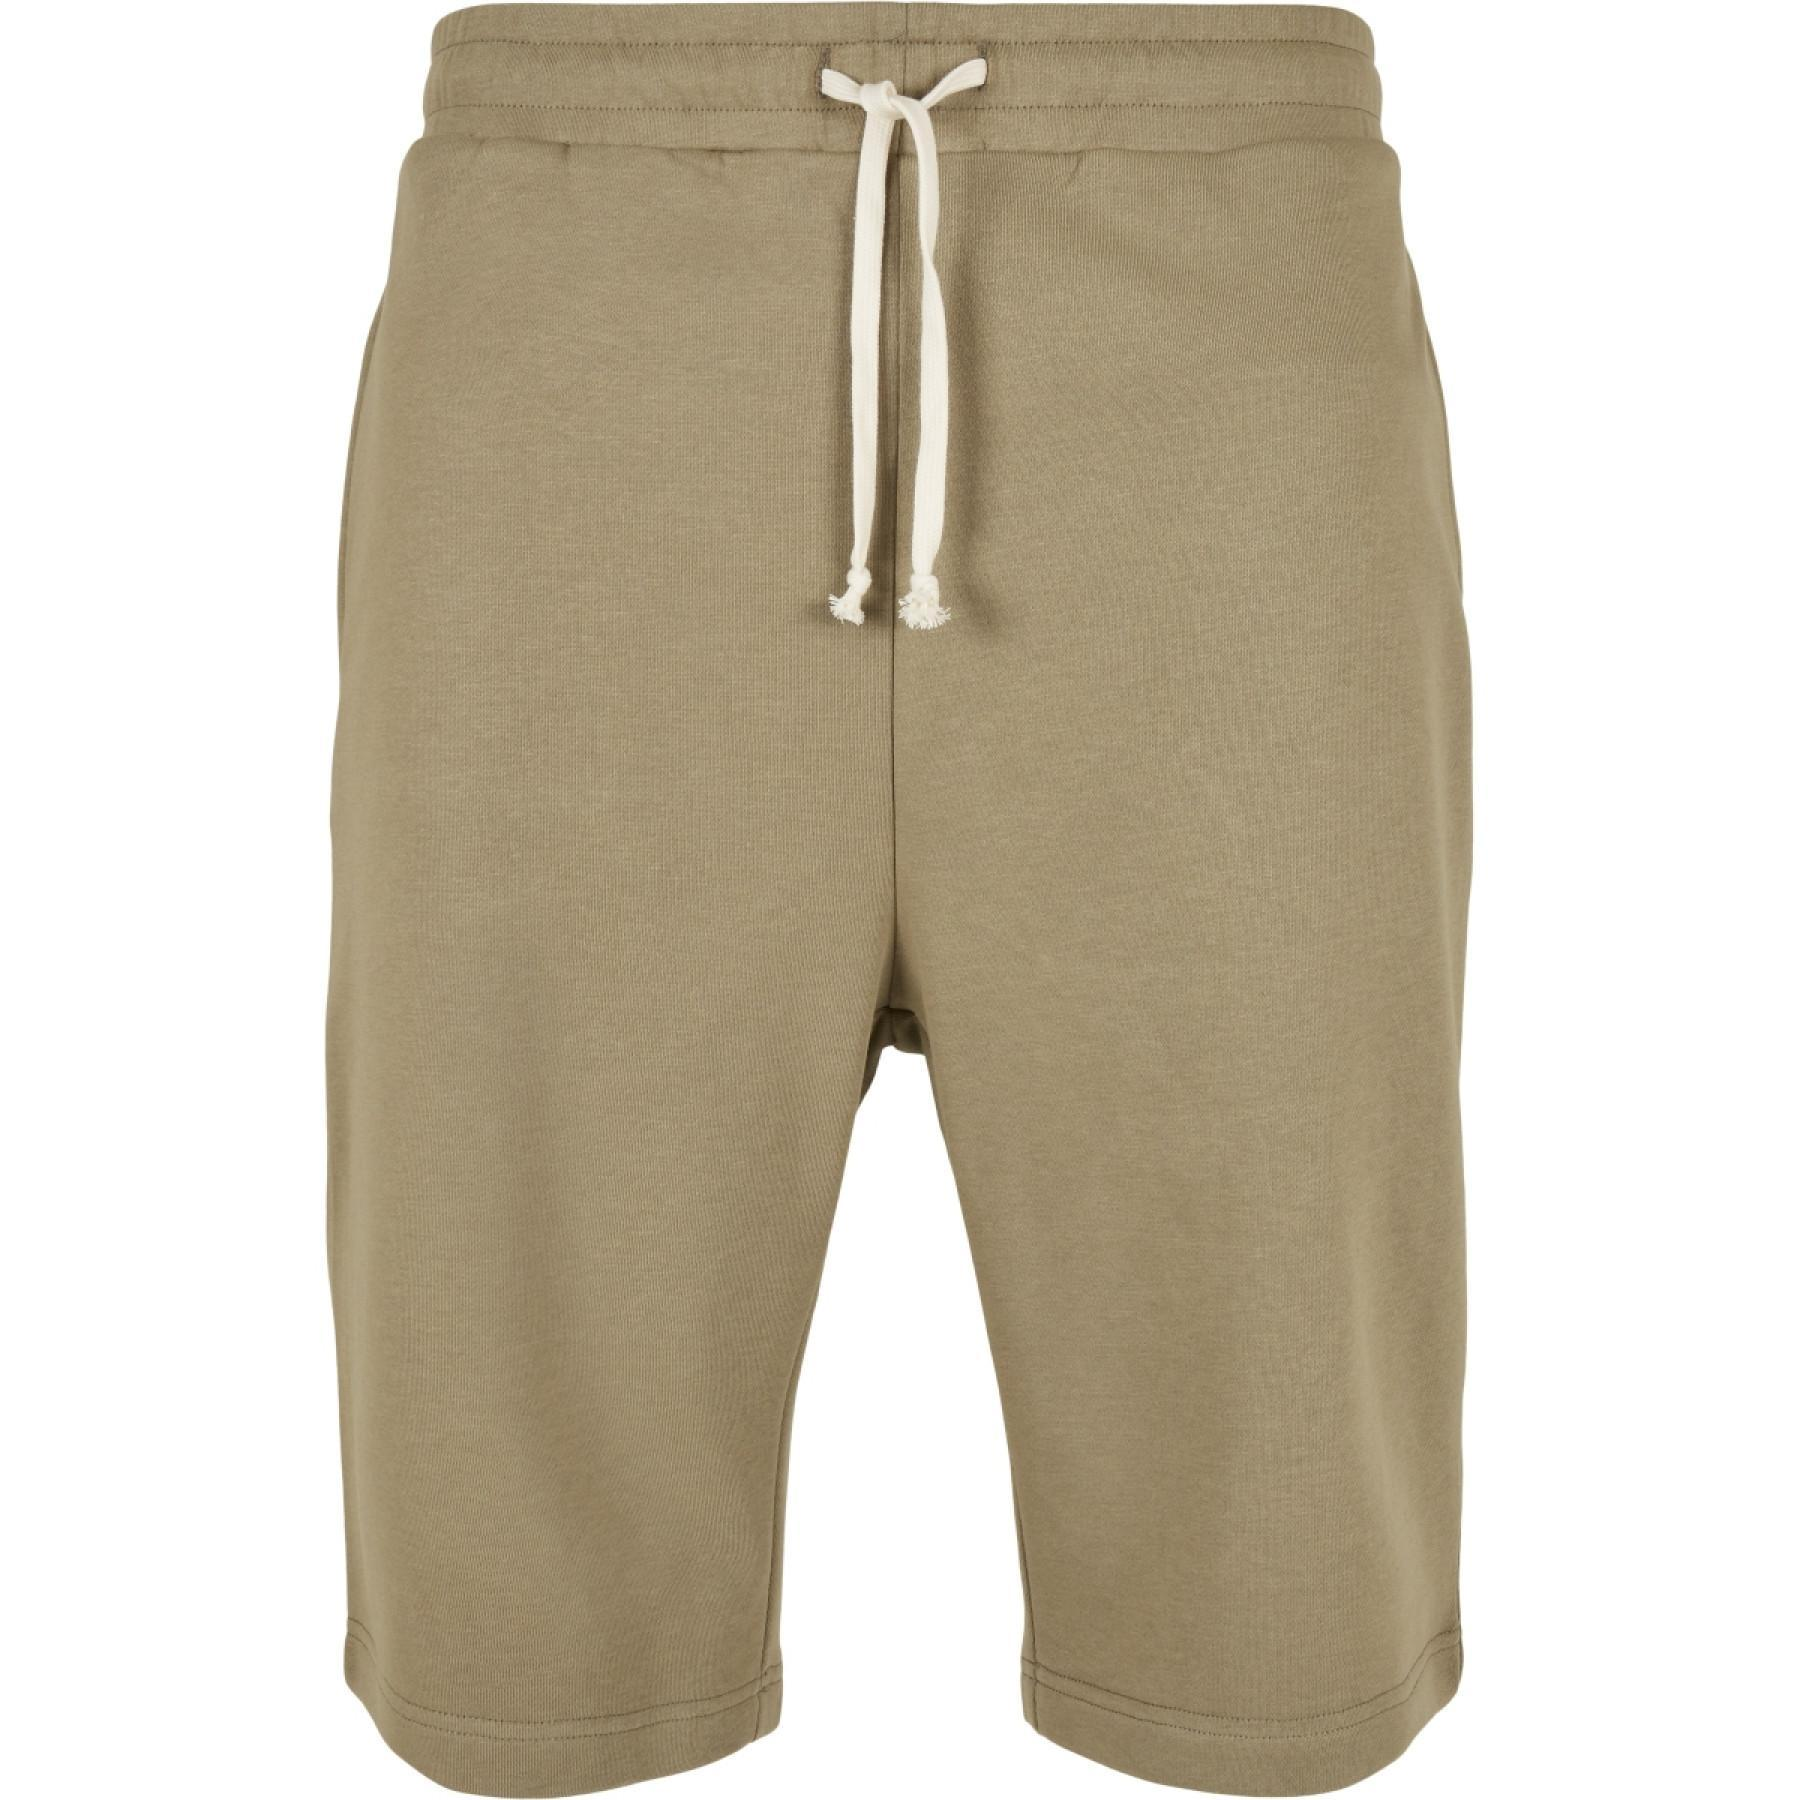 Urban Classics low crotch shorts